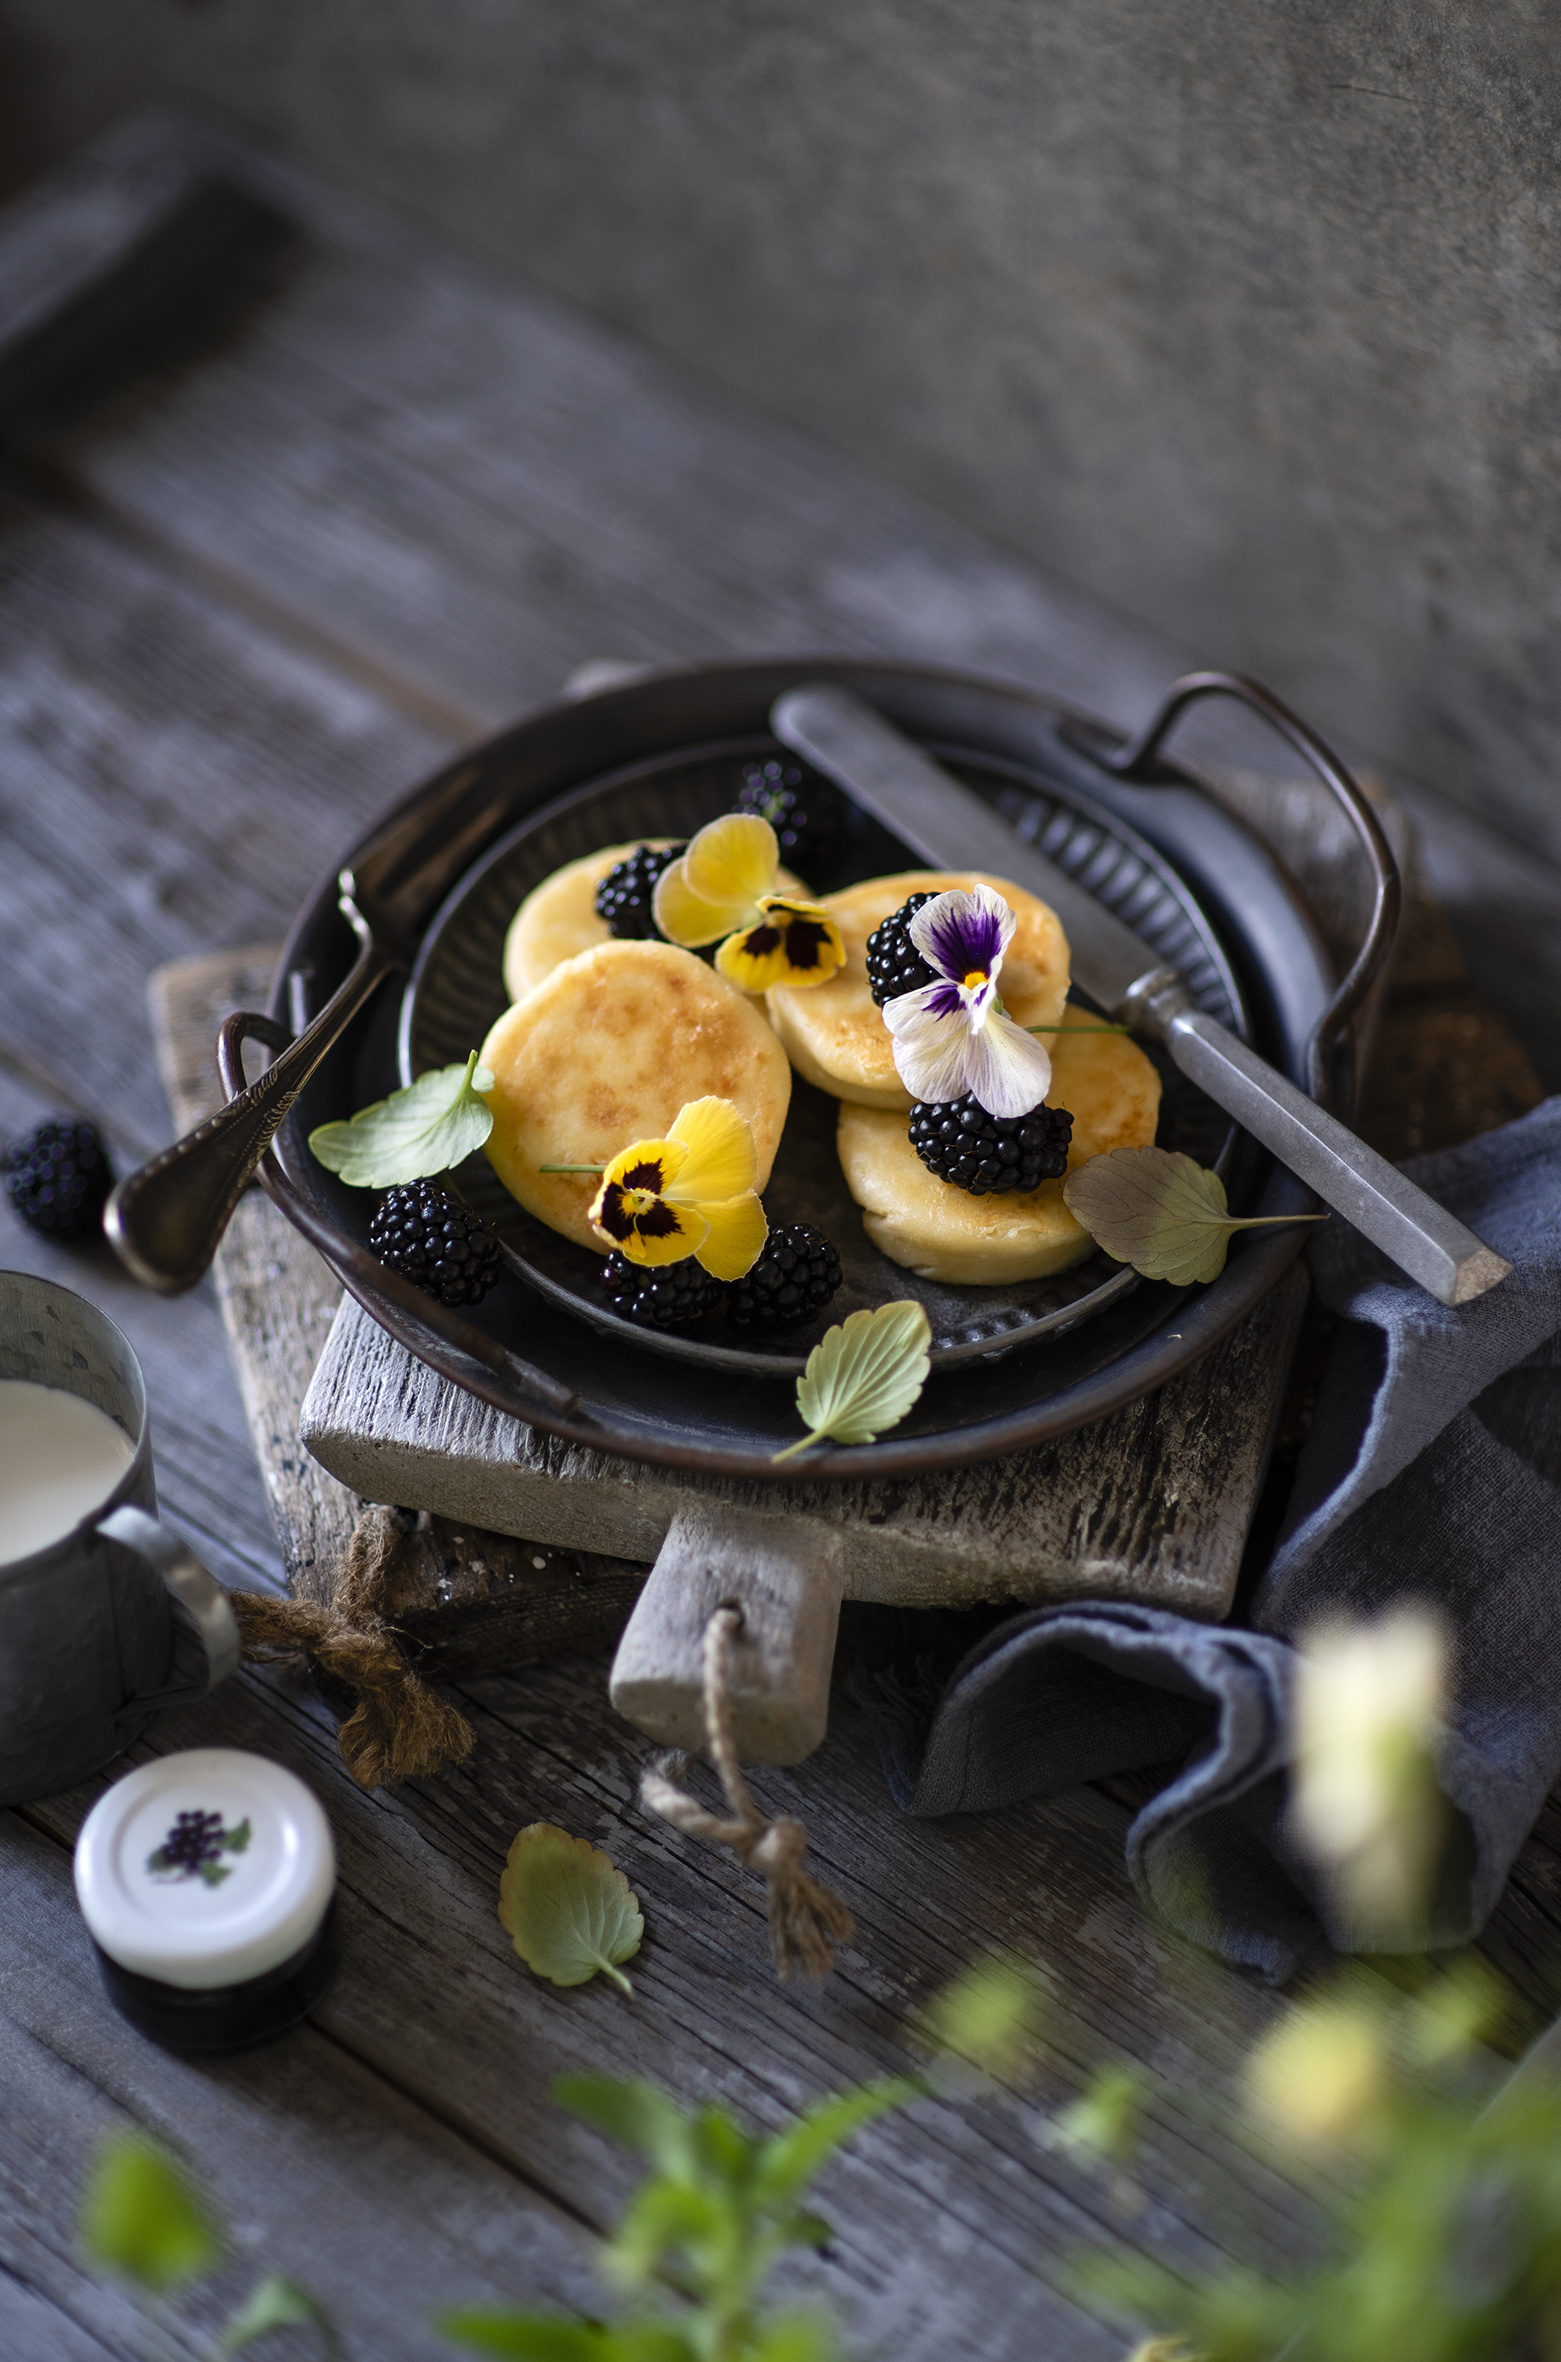 Desktop Wallpapers Pancake Viola tricolor Blackberry Frying pan Food boards  for Mobile phone hotcake Pansies heartsease Johnny Jump up frypan Wood planks